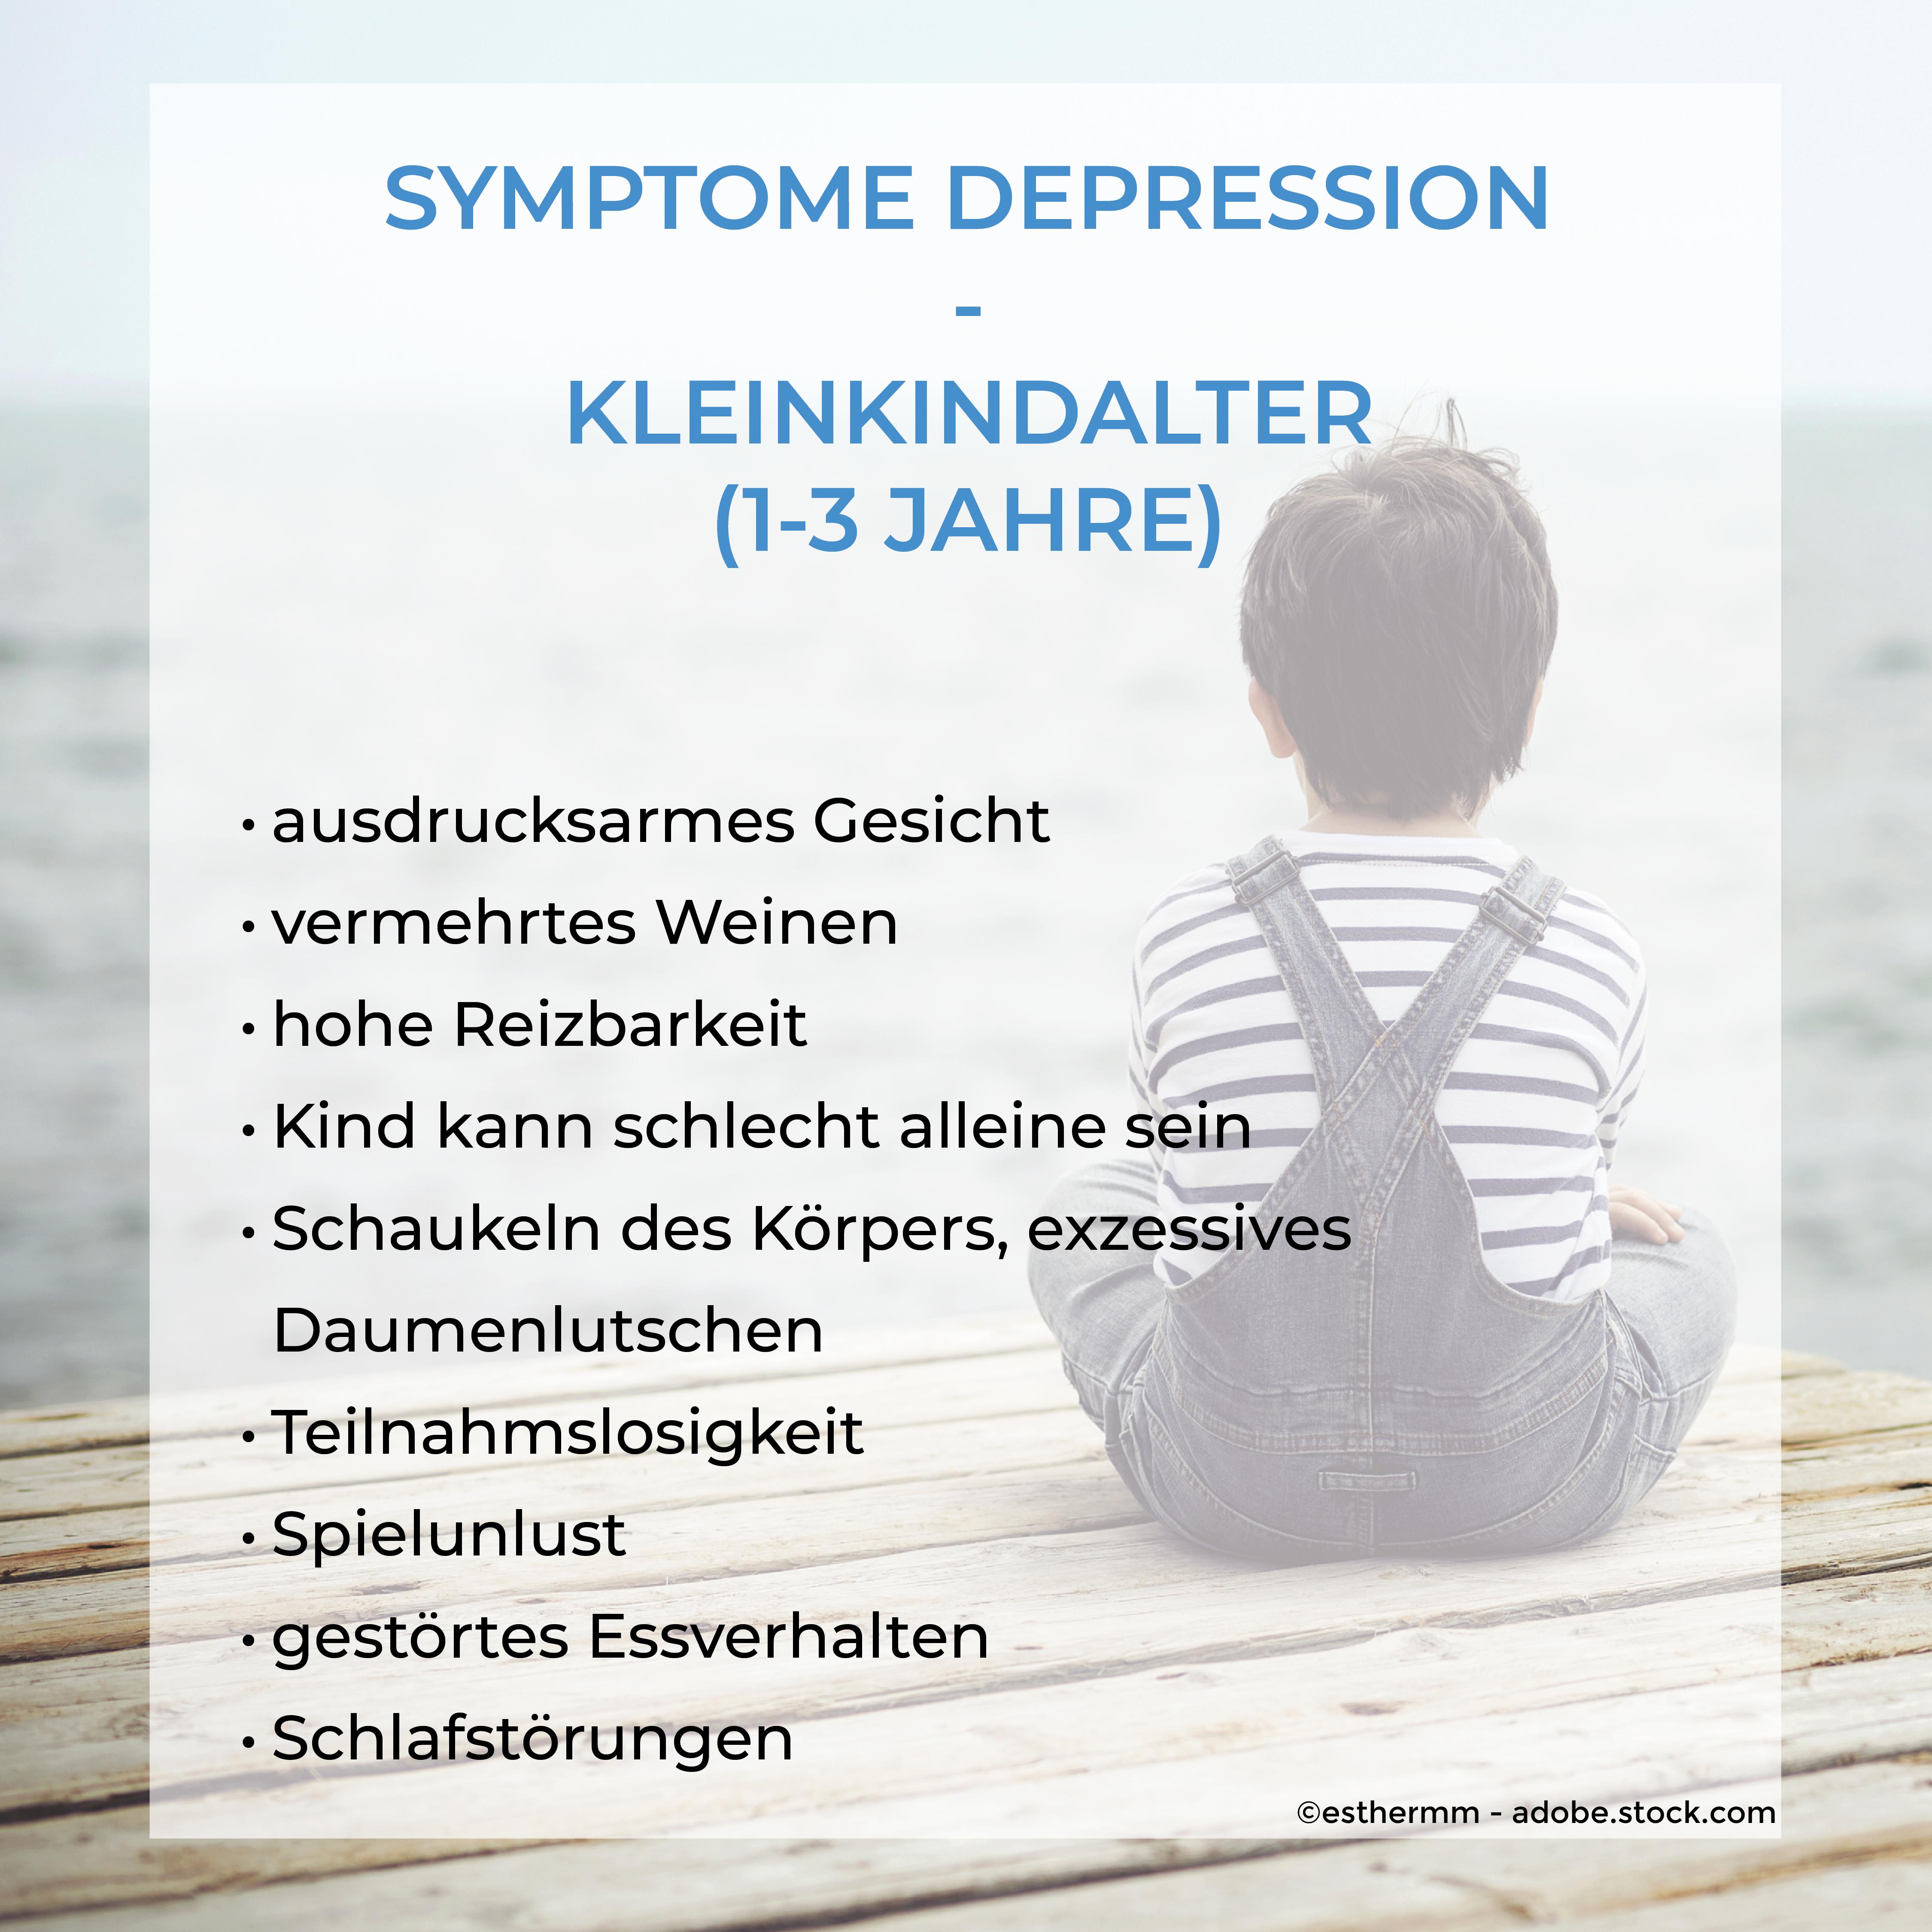 Symptome Kleinkindalter Depression